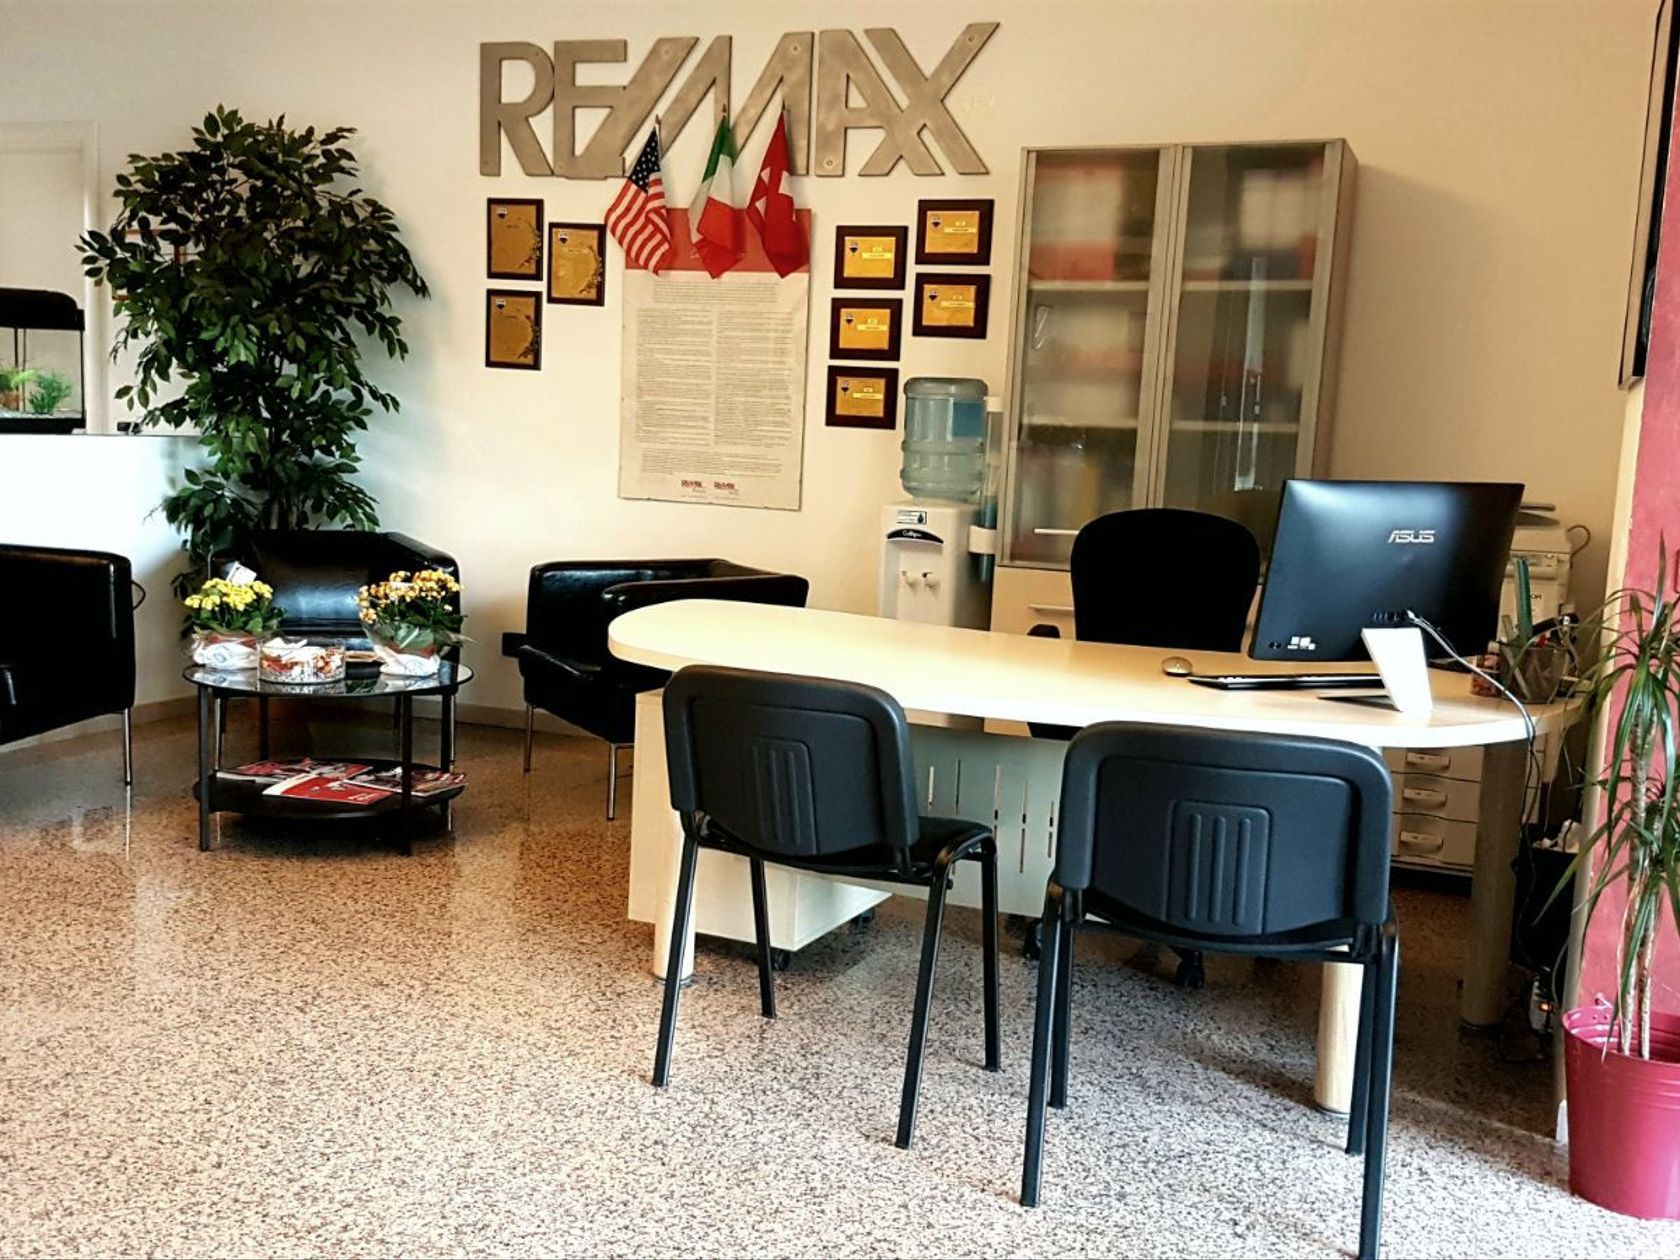 RE/MAX Trinity Settimo Milanese